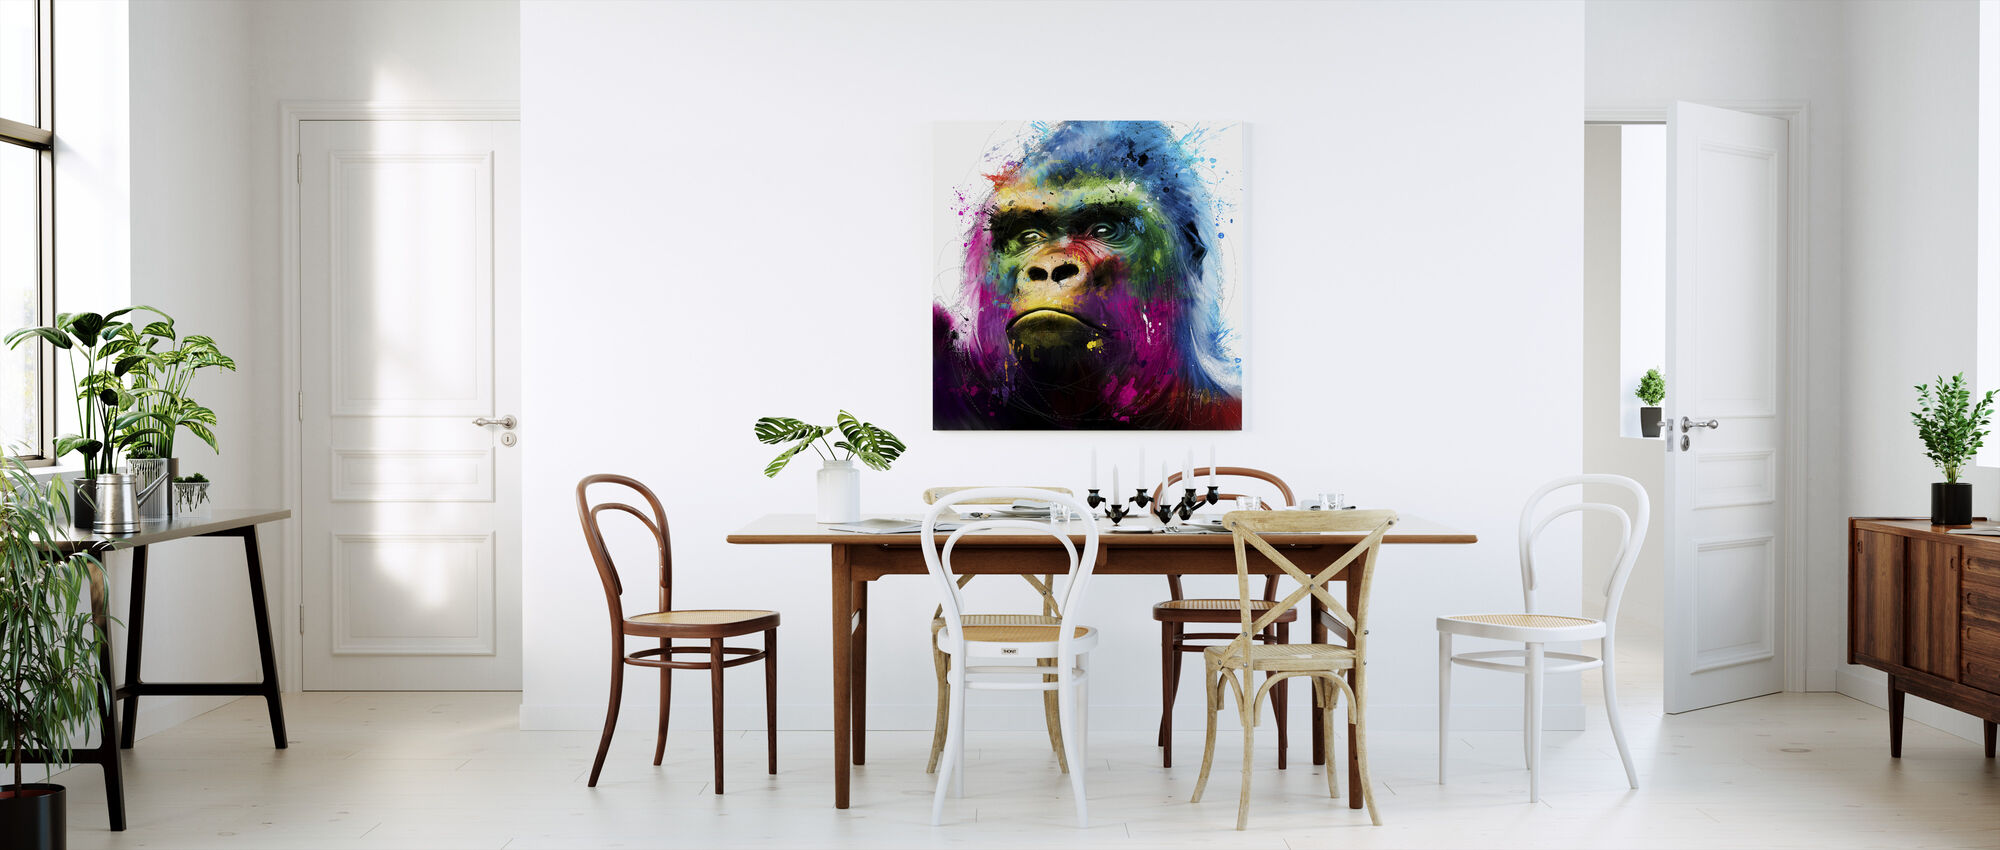 Gorille - Impression sur toile - Cuisine